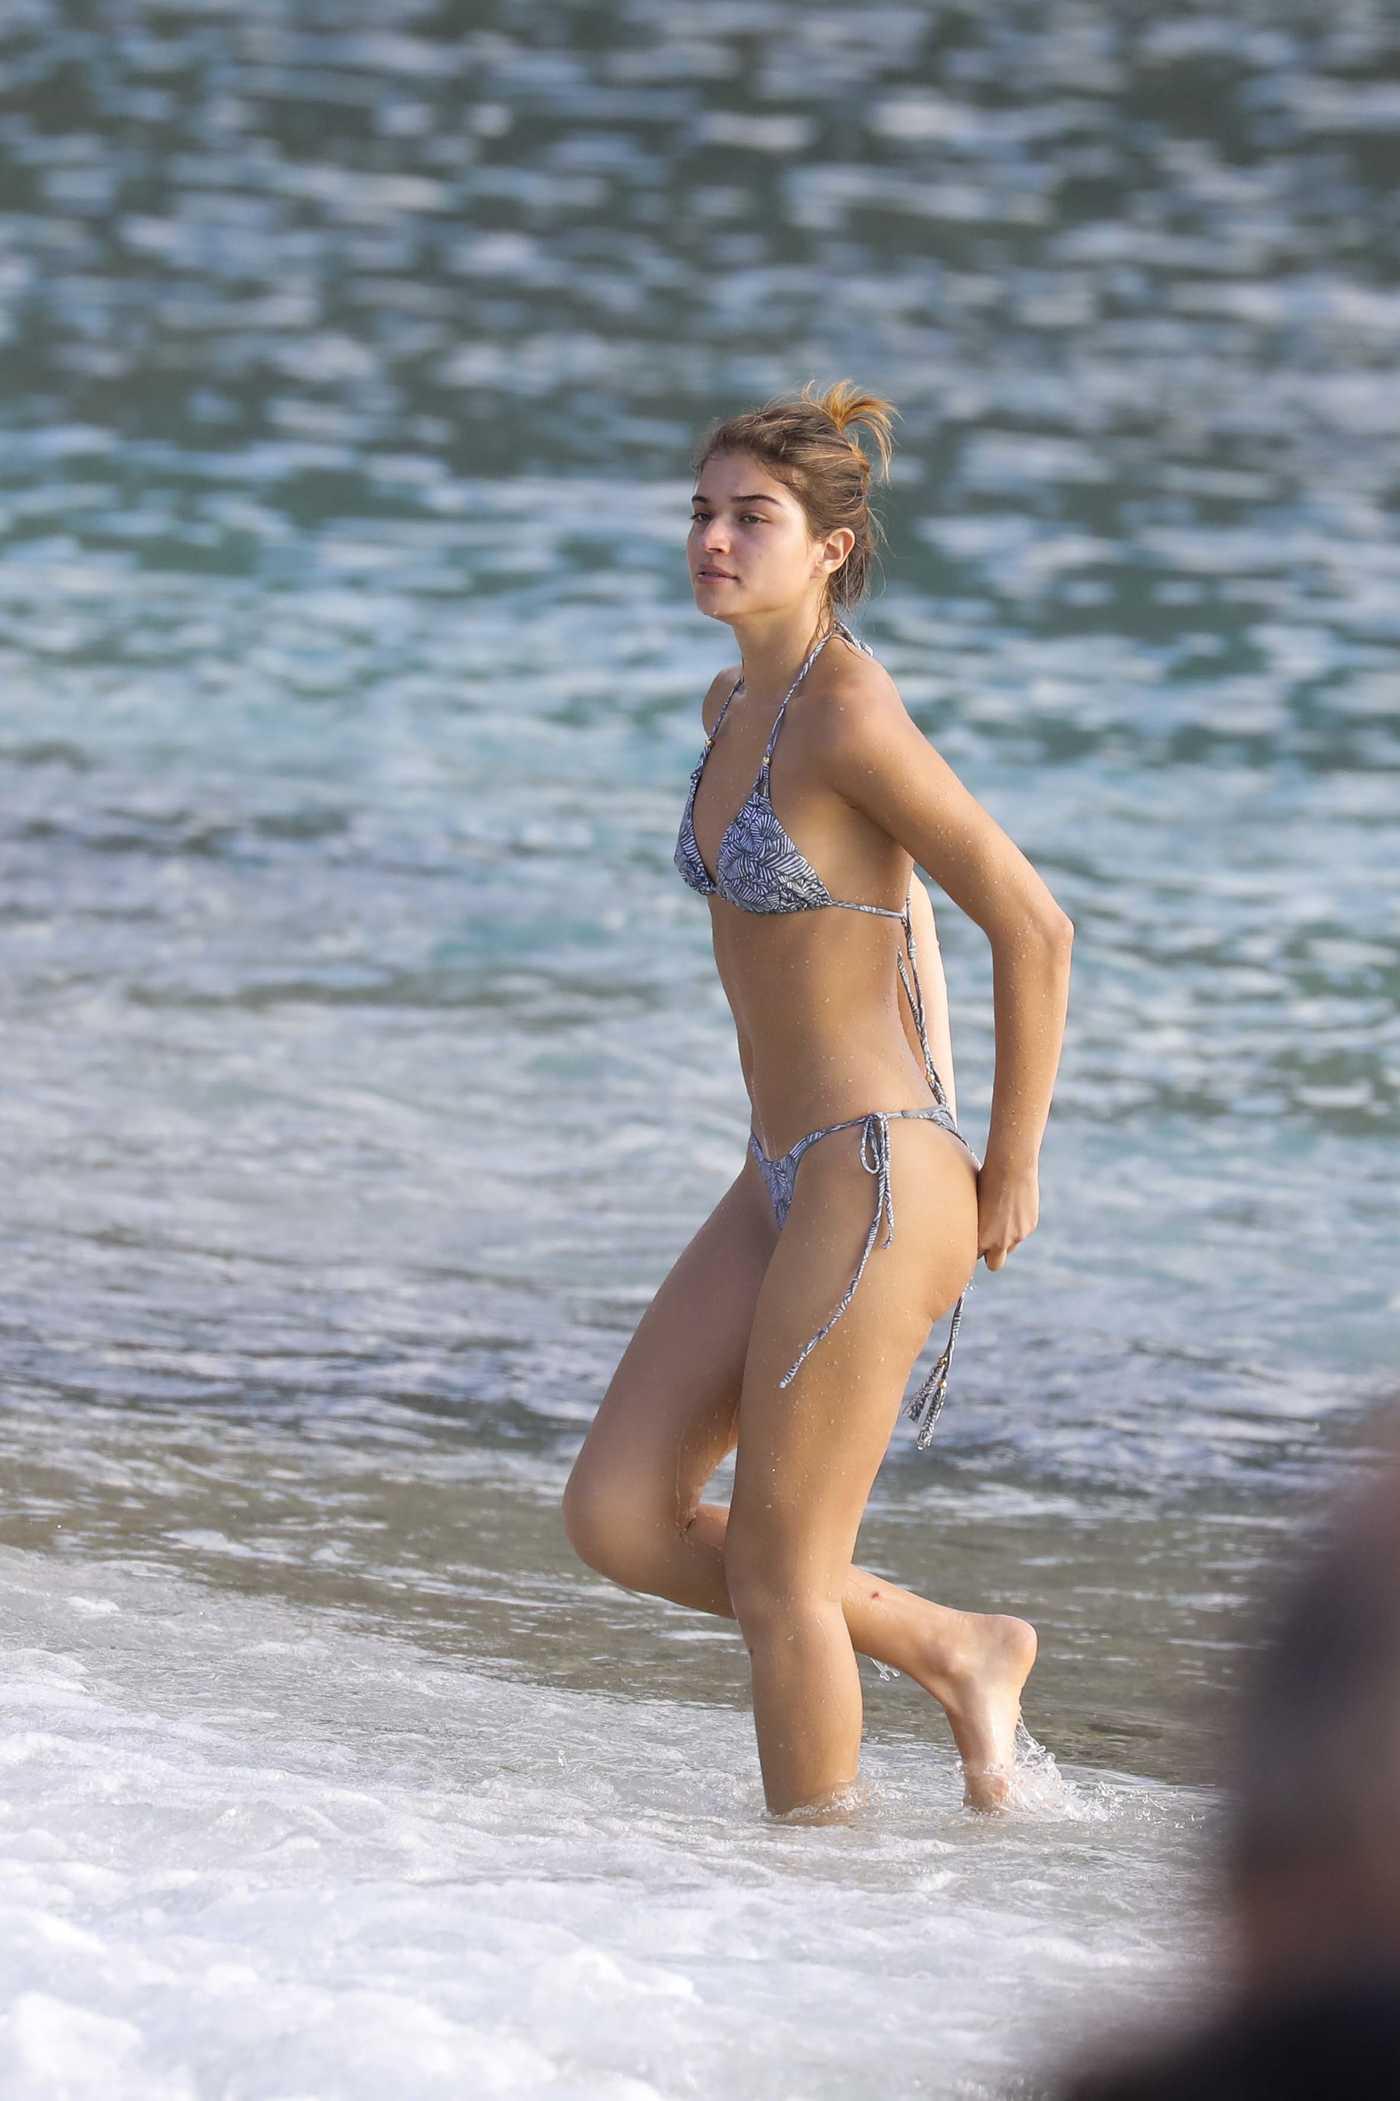 Daniela Lopez in Bikini at the Beach in St Barth 01/15/2017